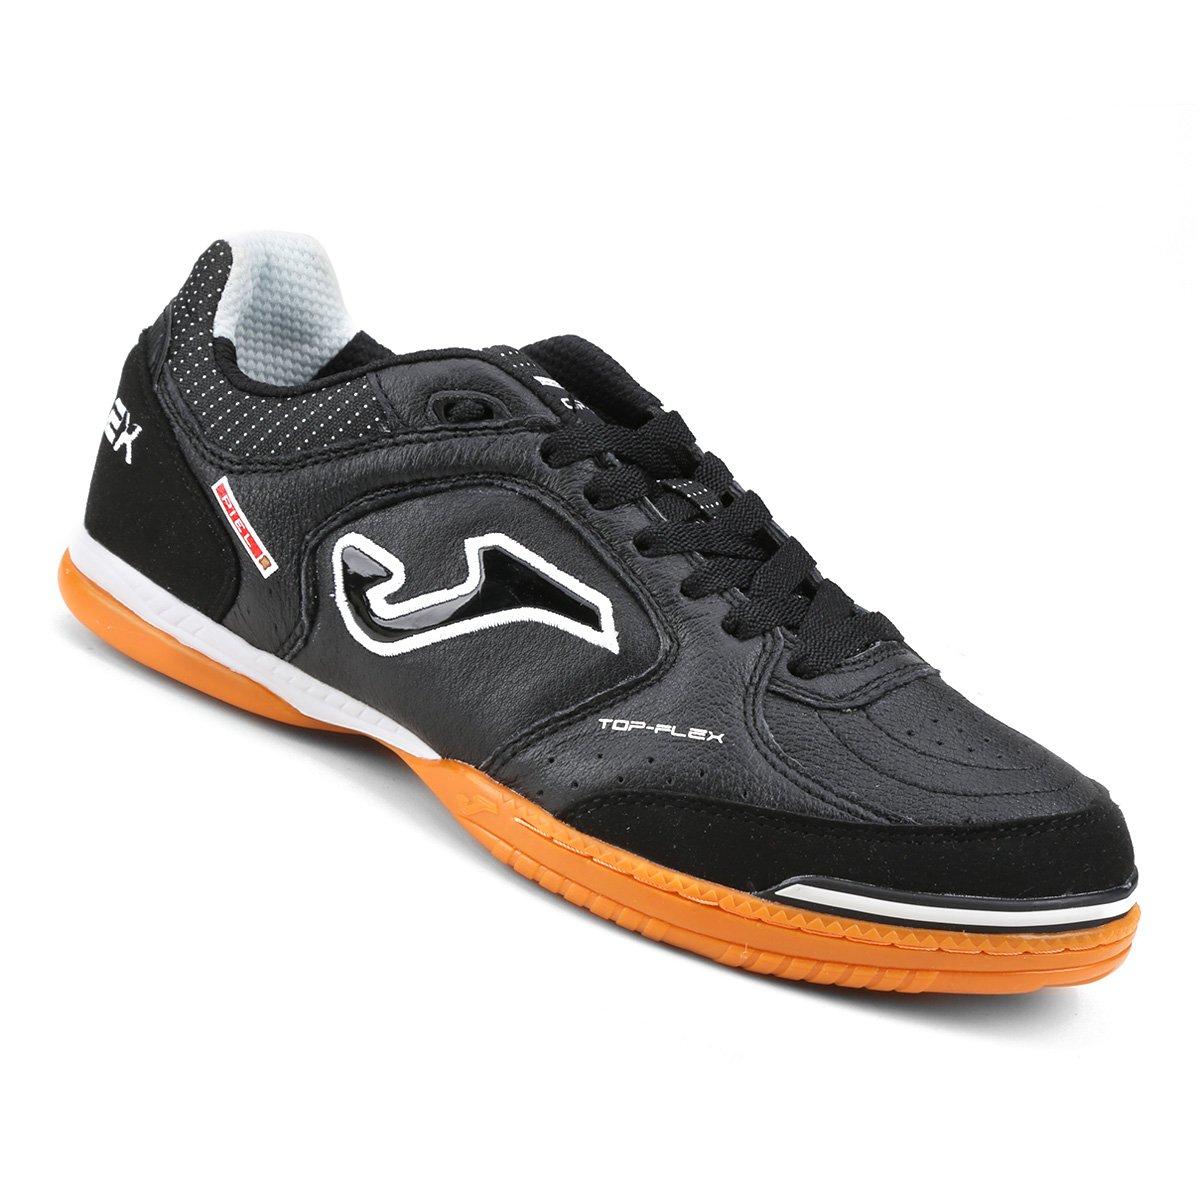 ac2cd5f3266 Chuteira Futsal Joma Top Flex - Compre Agora